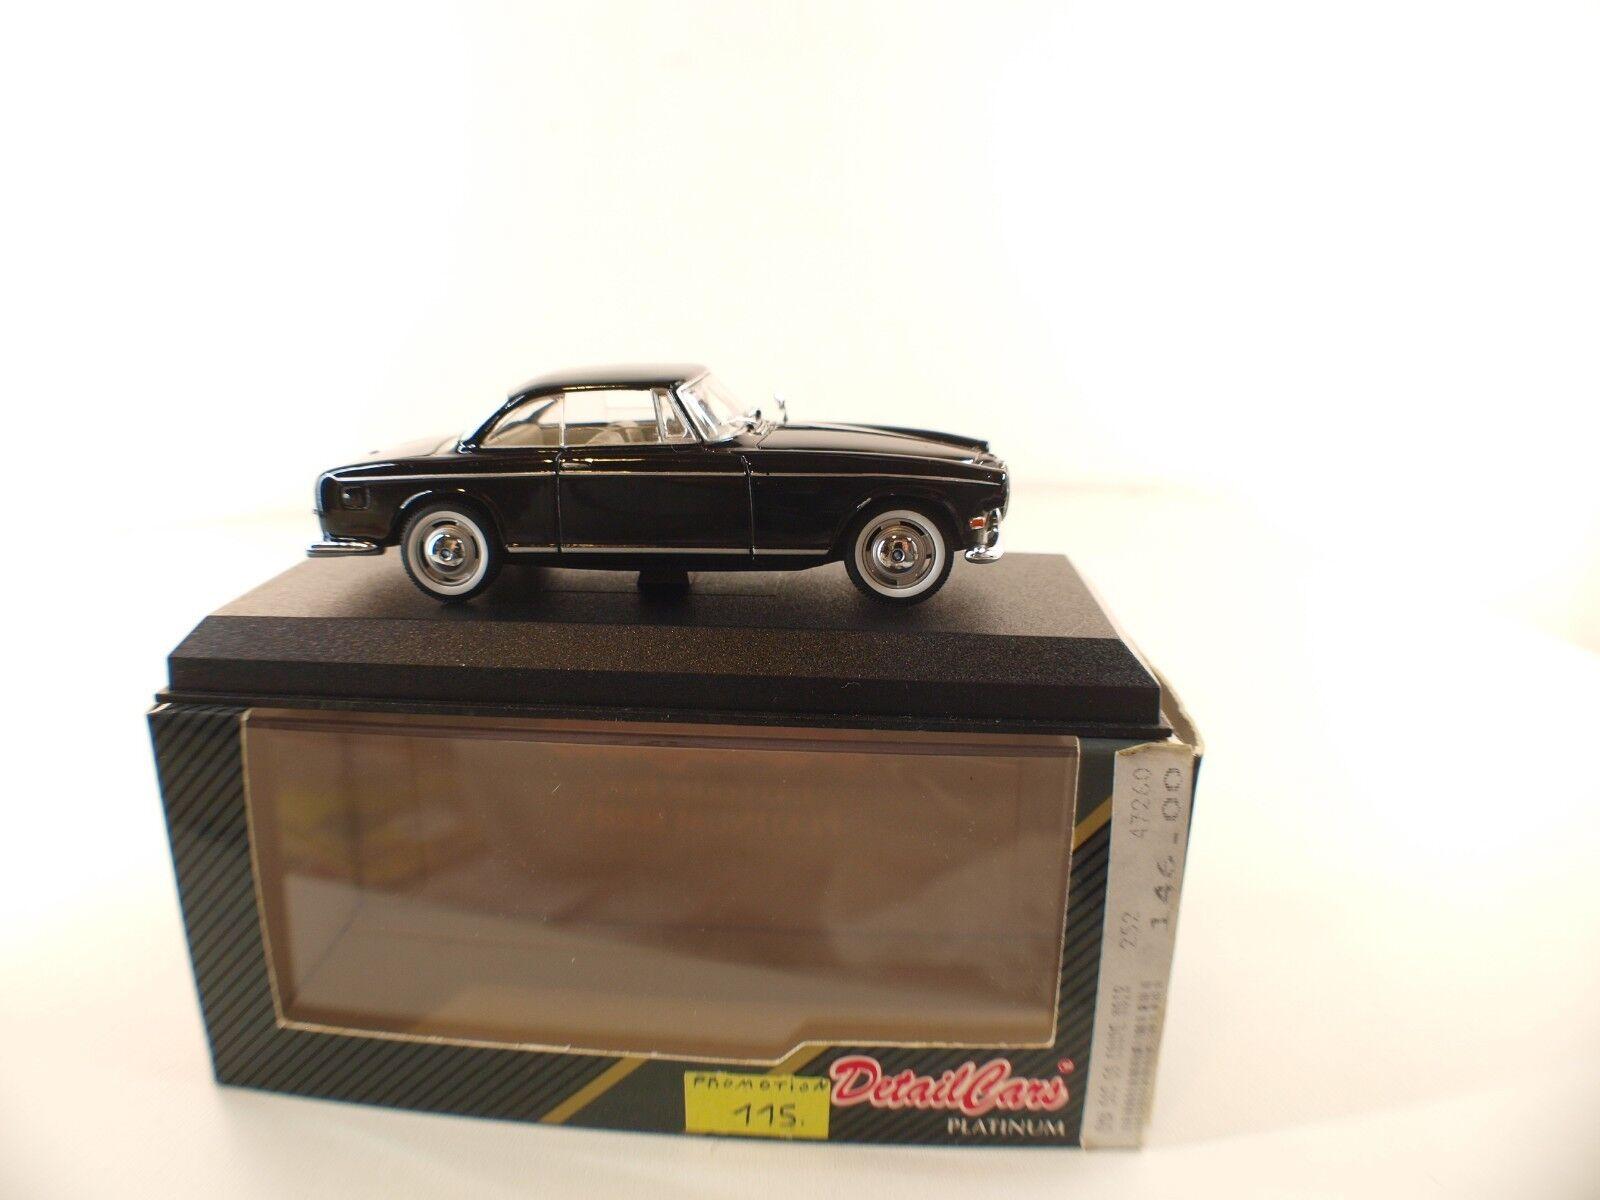 Detail Cars art.252 • BMW 503 503 503 Coupé 1959 • 1 43 boxed  boîte MIB 466488